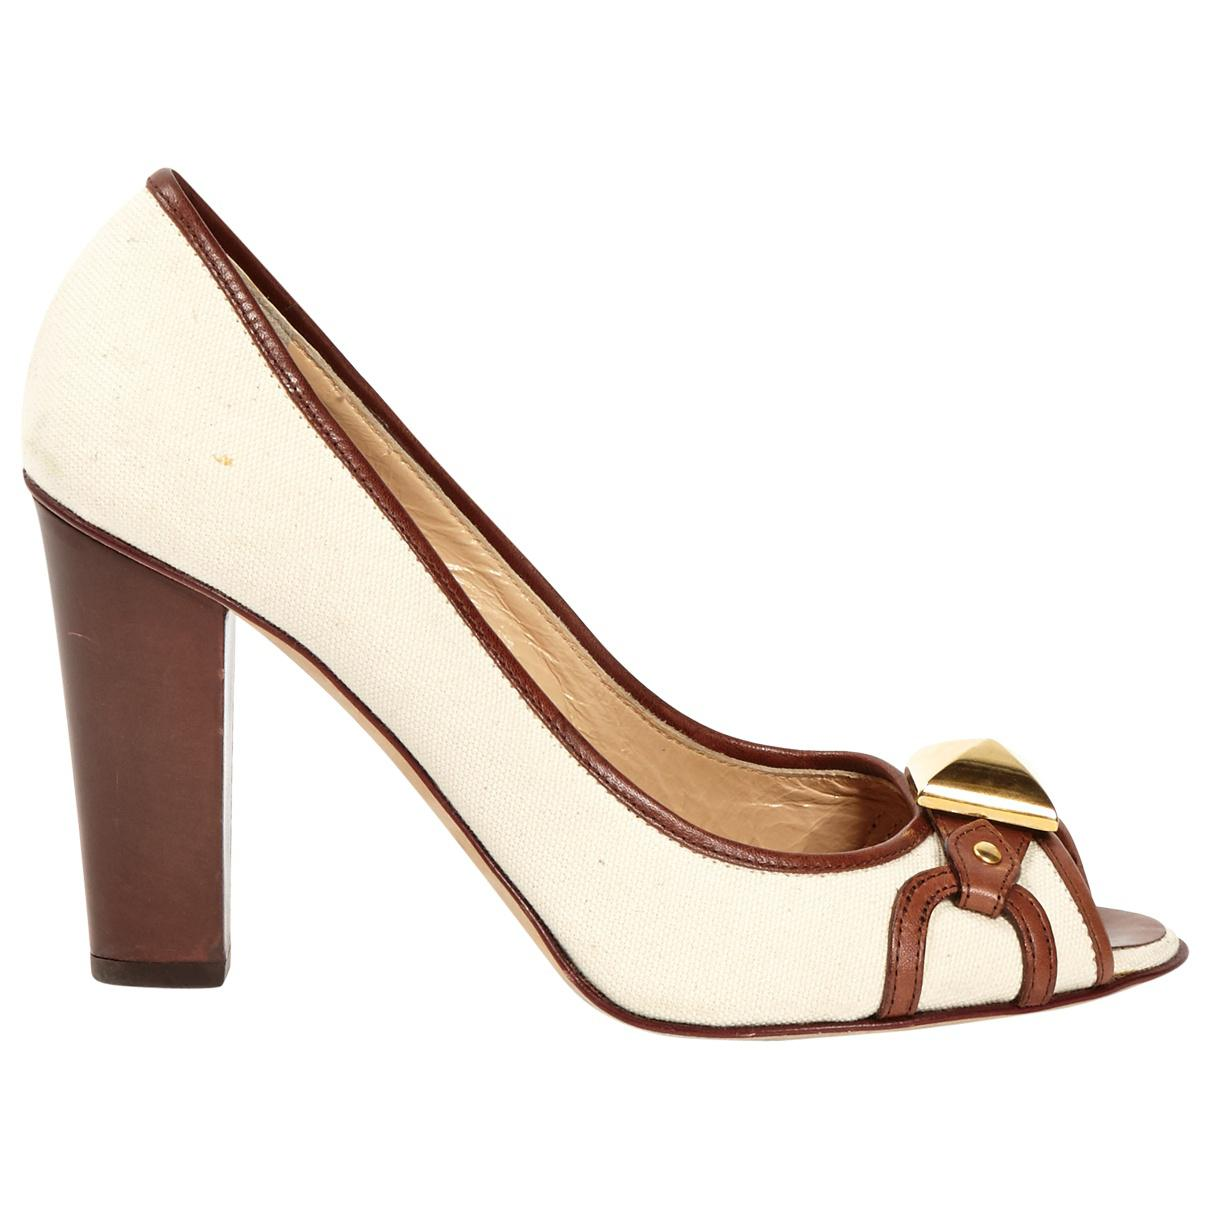 7936740018c61 Giuseppe Zanotti. Women s Cloth Heels